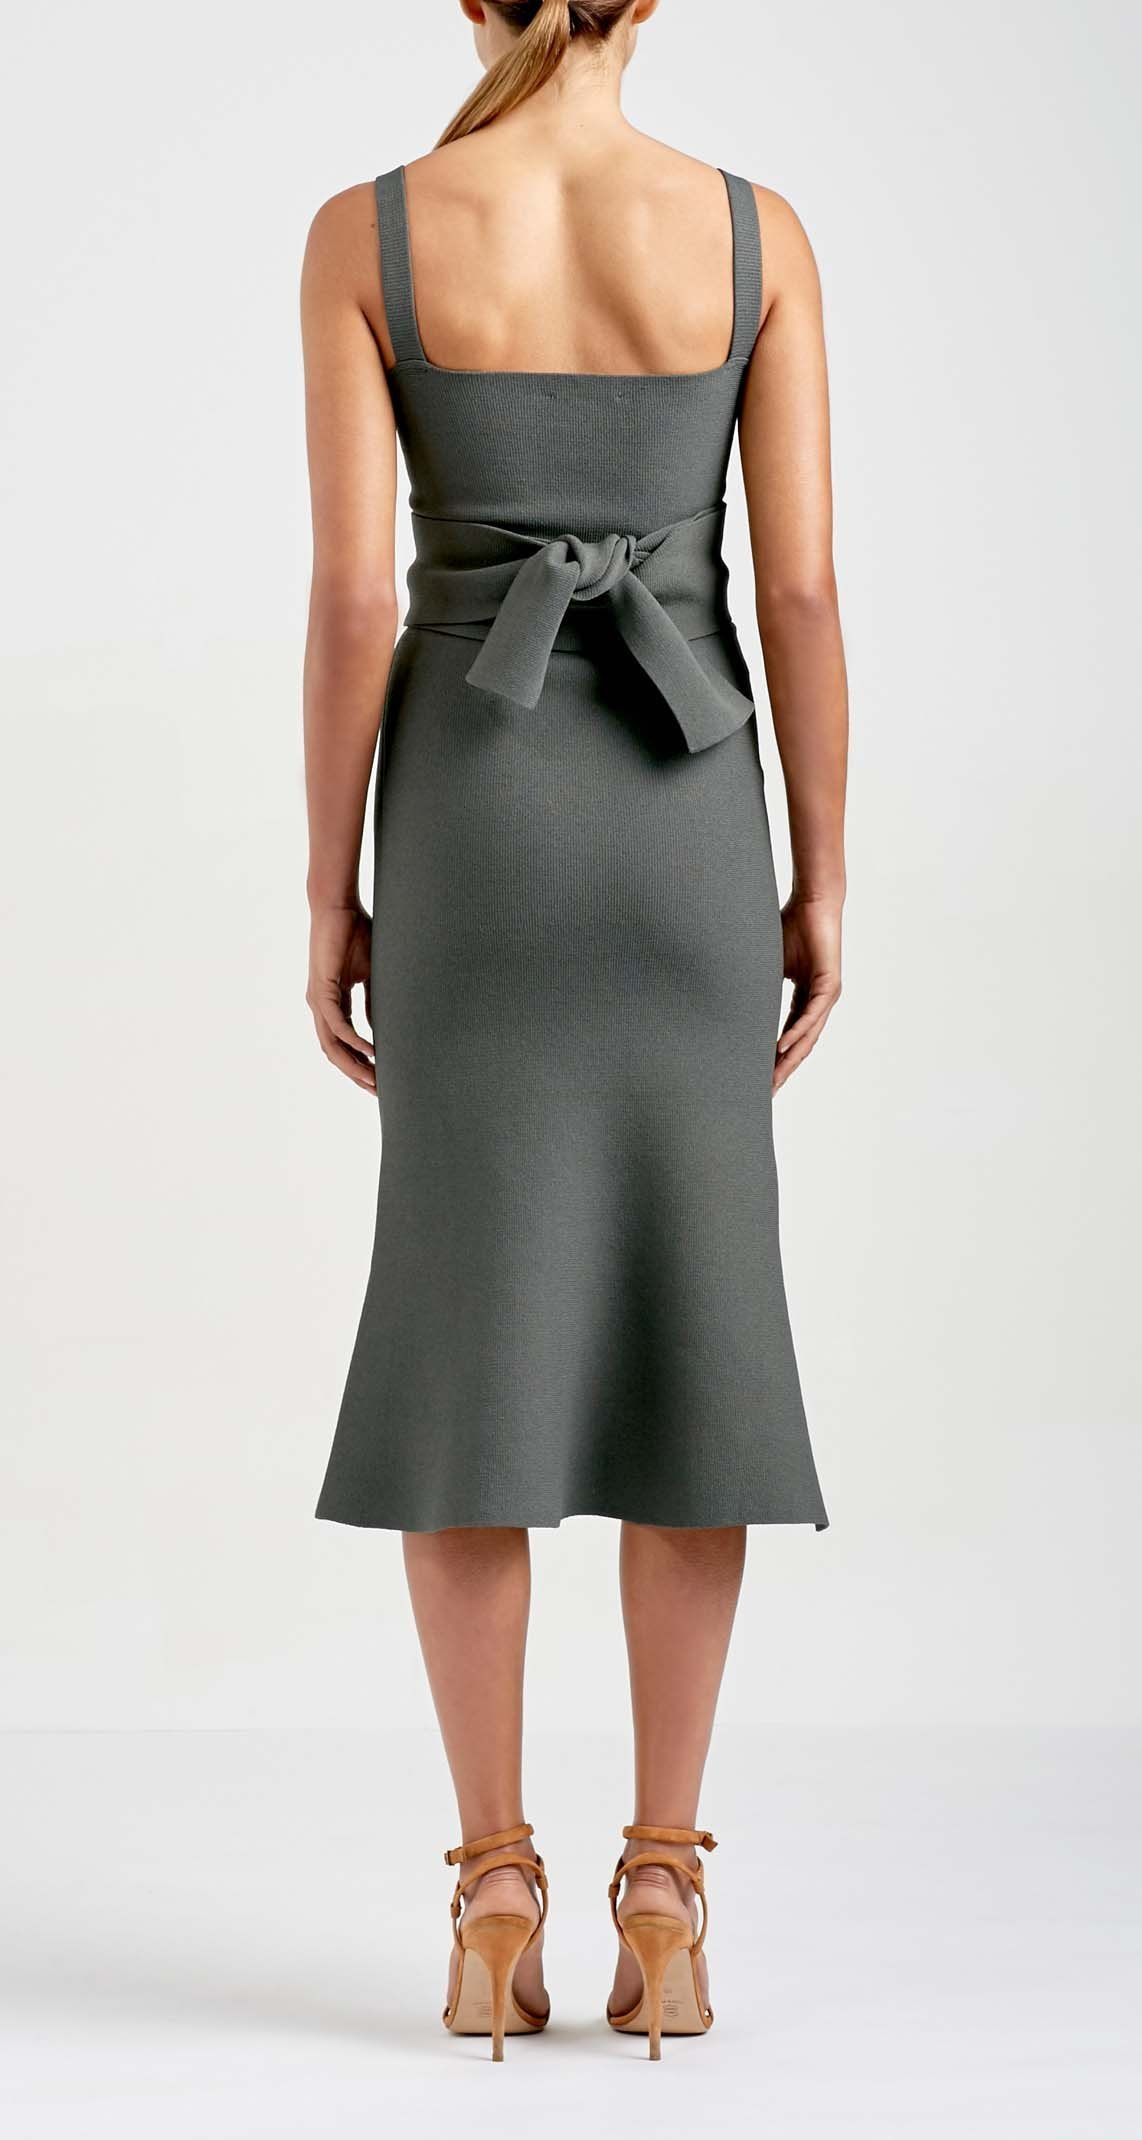 a6d1194fb1ece ... Scanlan Theodore - Crepe Knit Bralette Dress Grey Size 6 ...